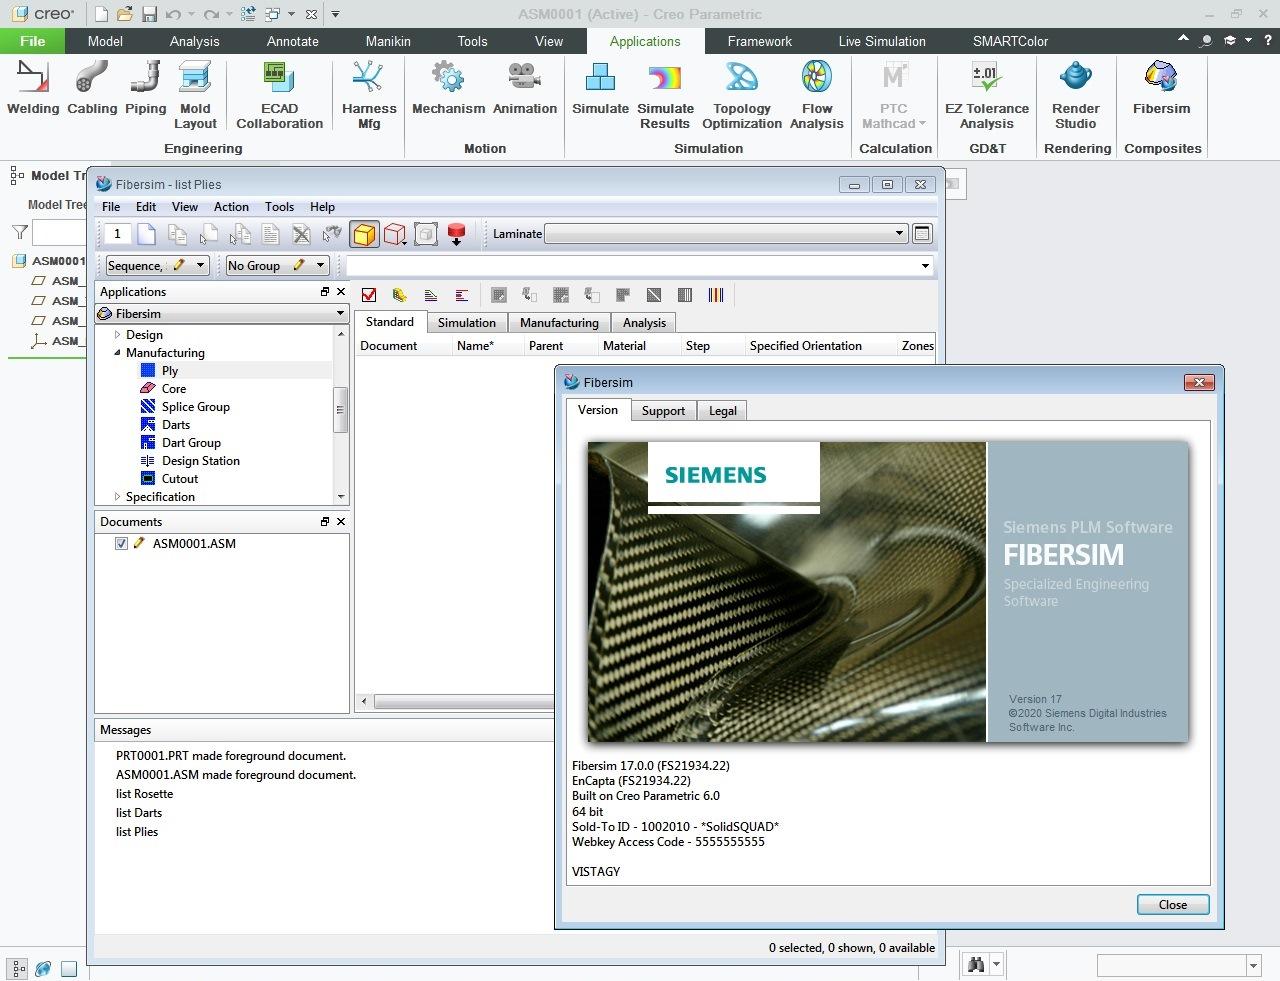 Working with Siemens FiberSIM 17.0.0 for Creo full license